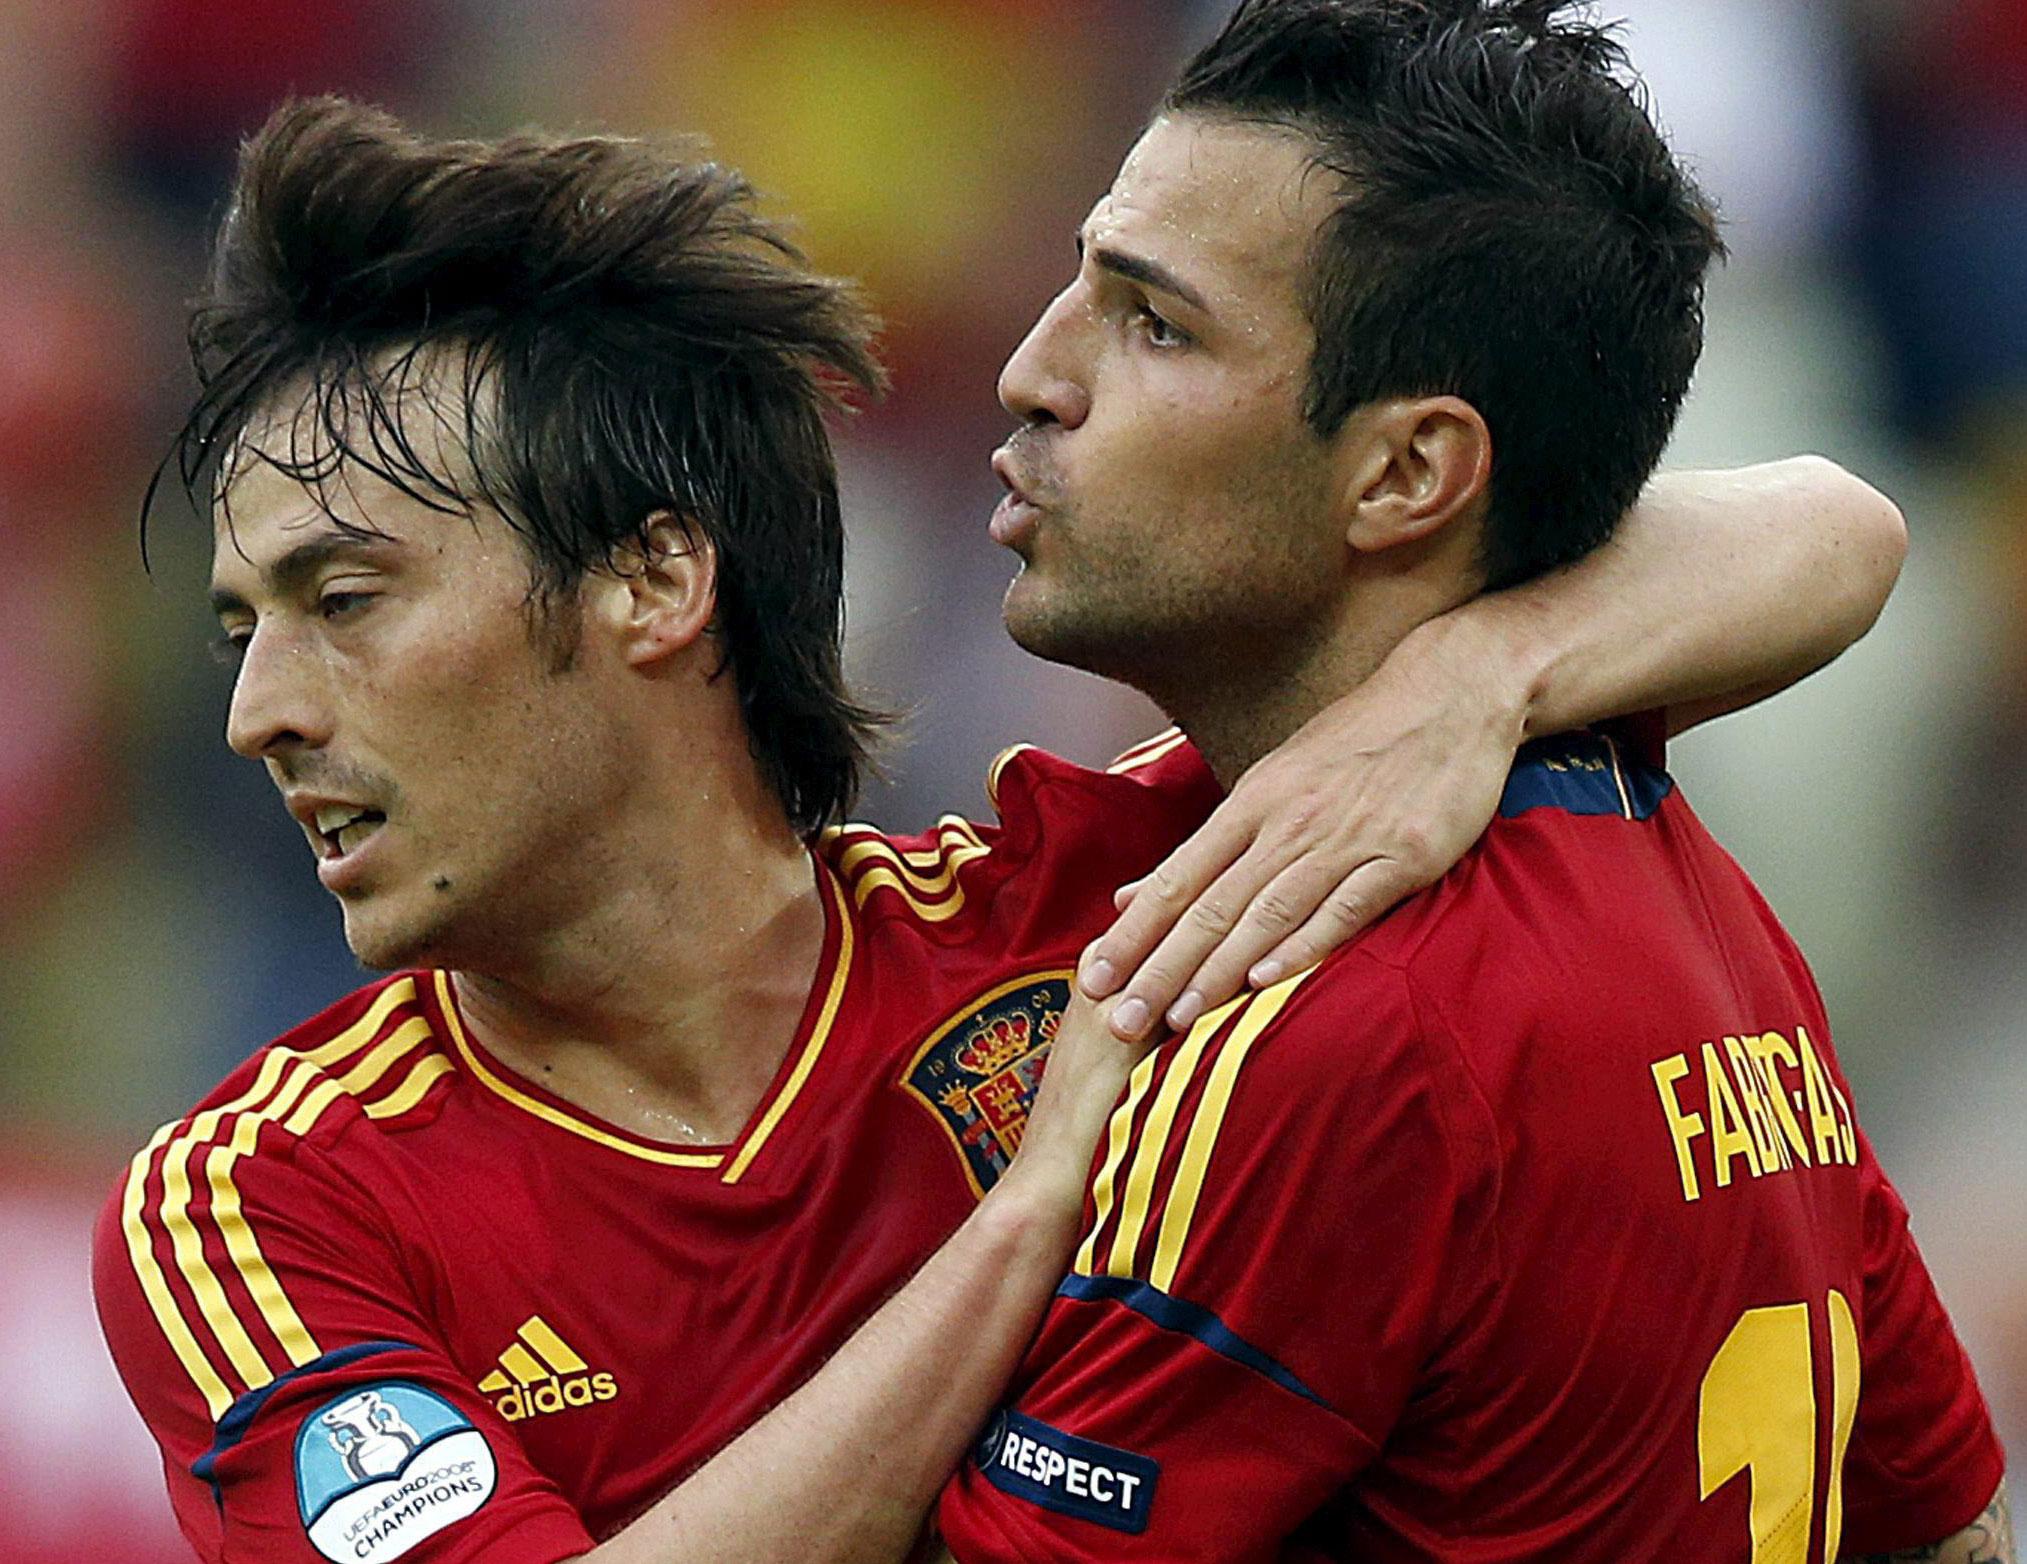 David Silva abraza a Cesc Fábregas en el gol de la selección ante Italia